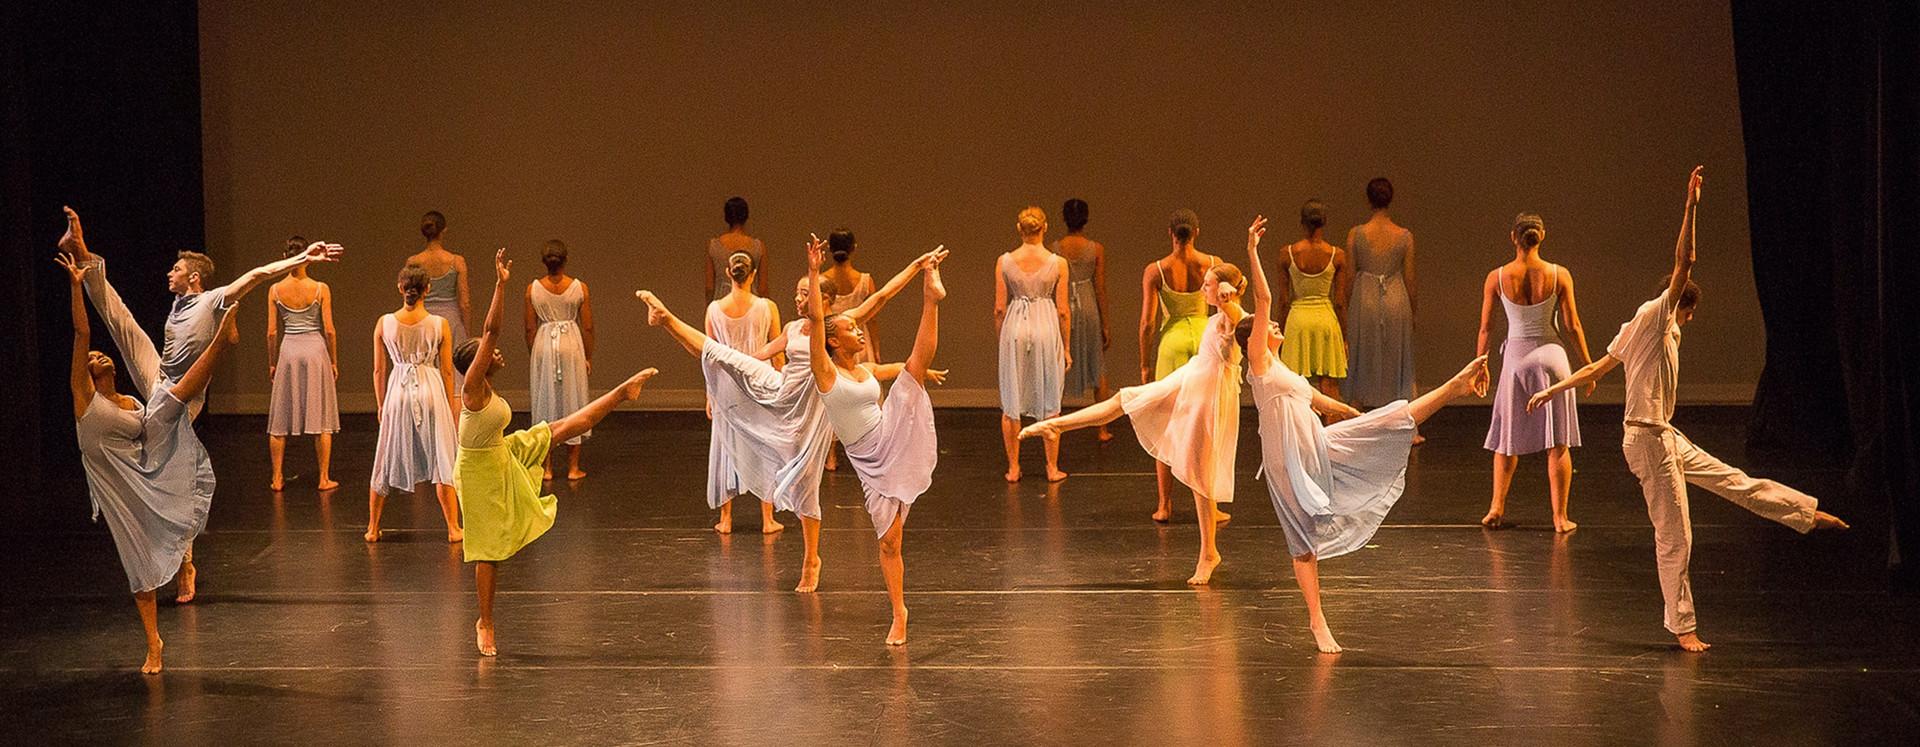 """SOMEWHERE"", choreographed by Hai Cohen"